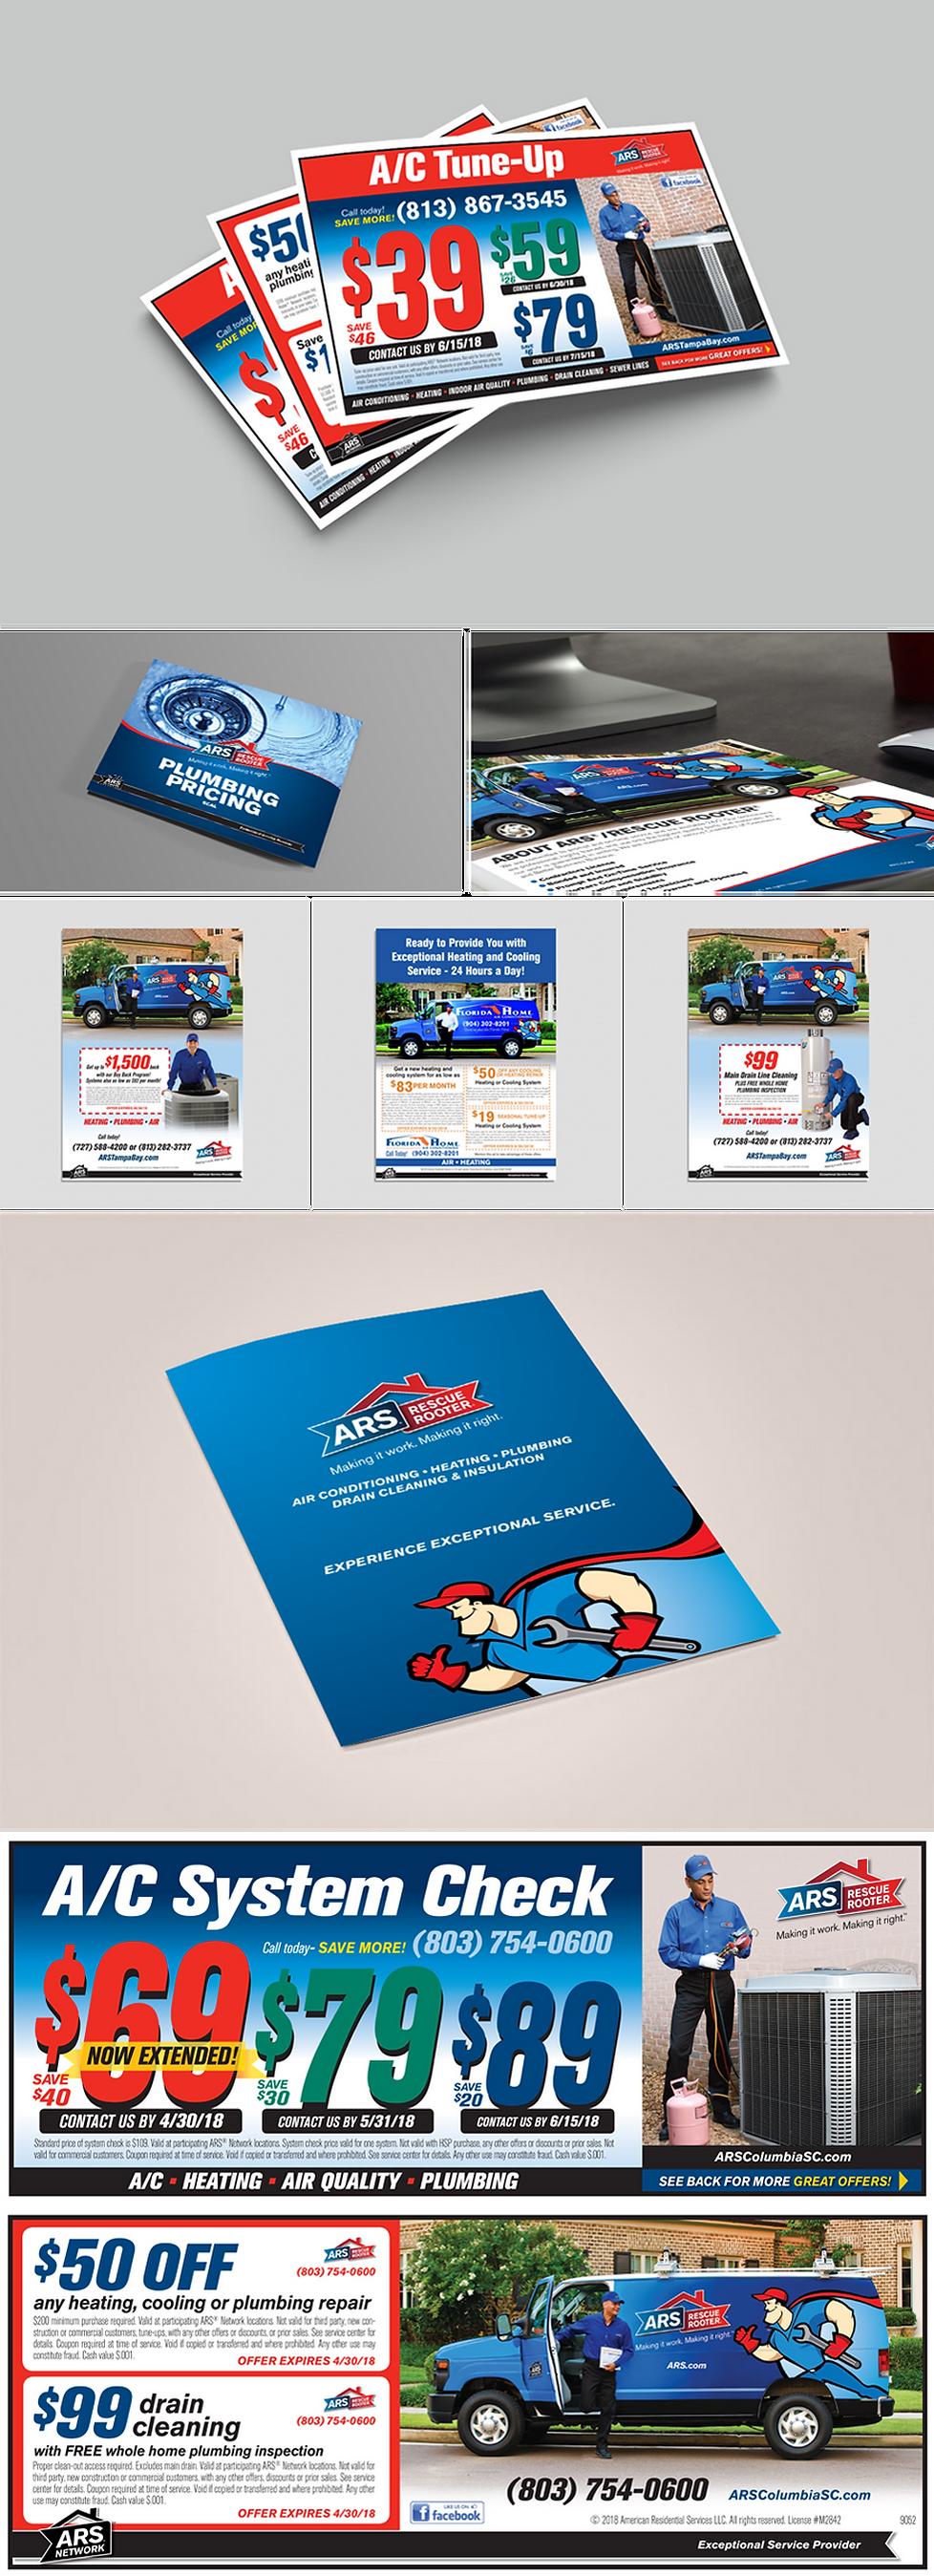 ars_brandappeal_design.png